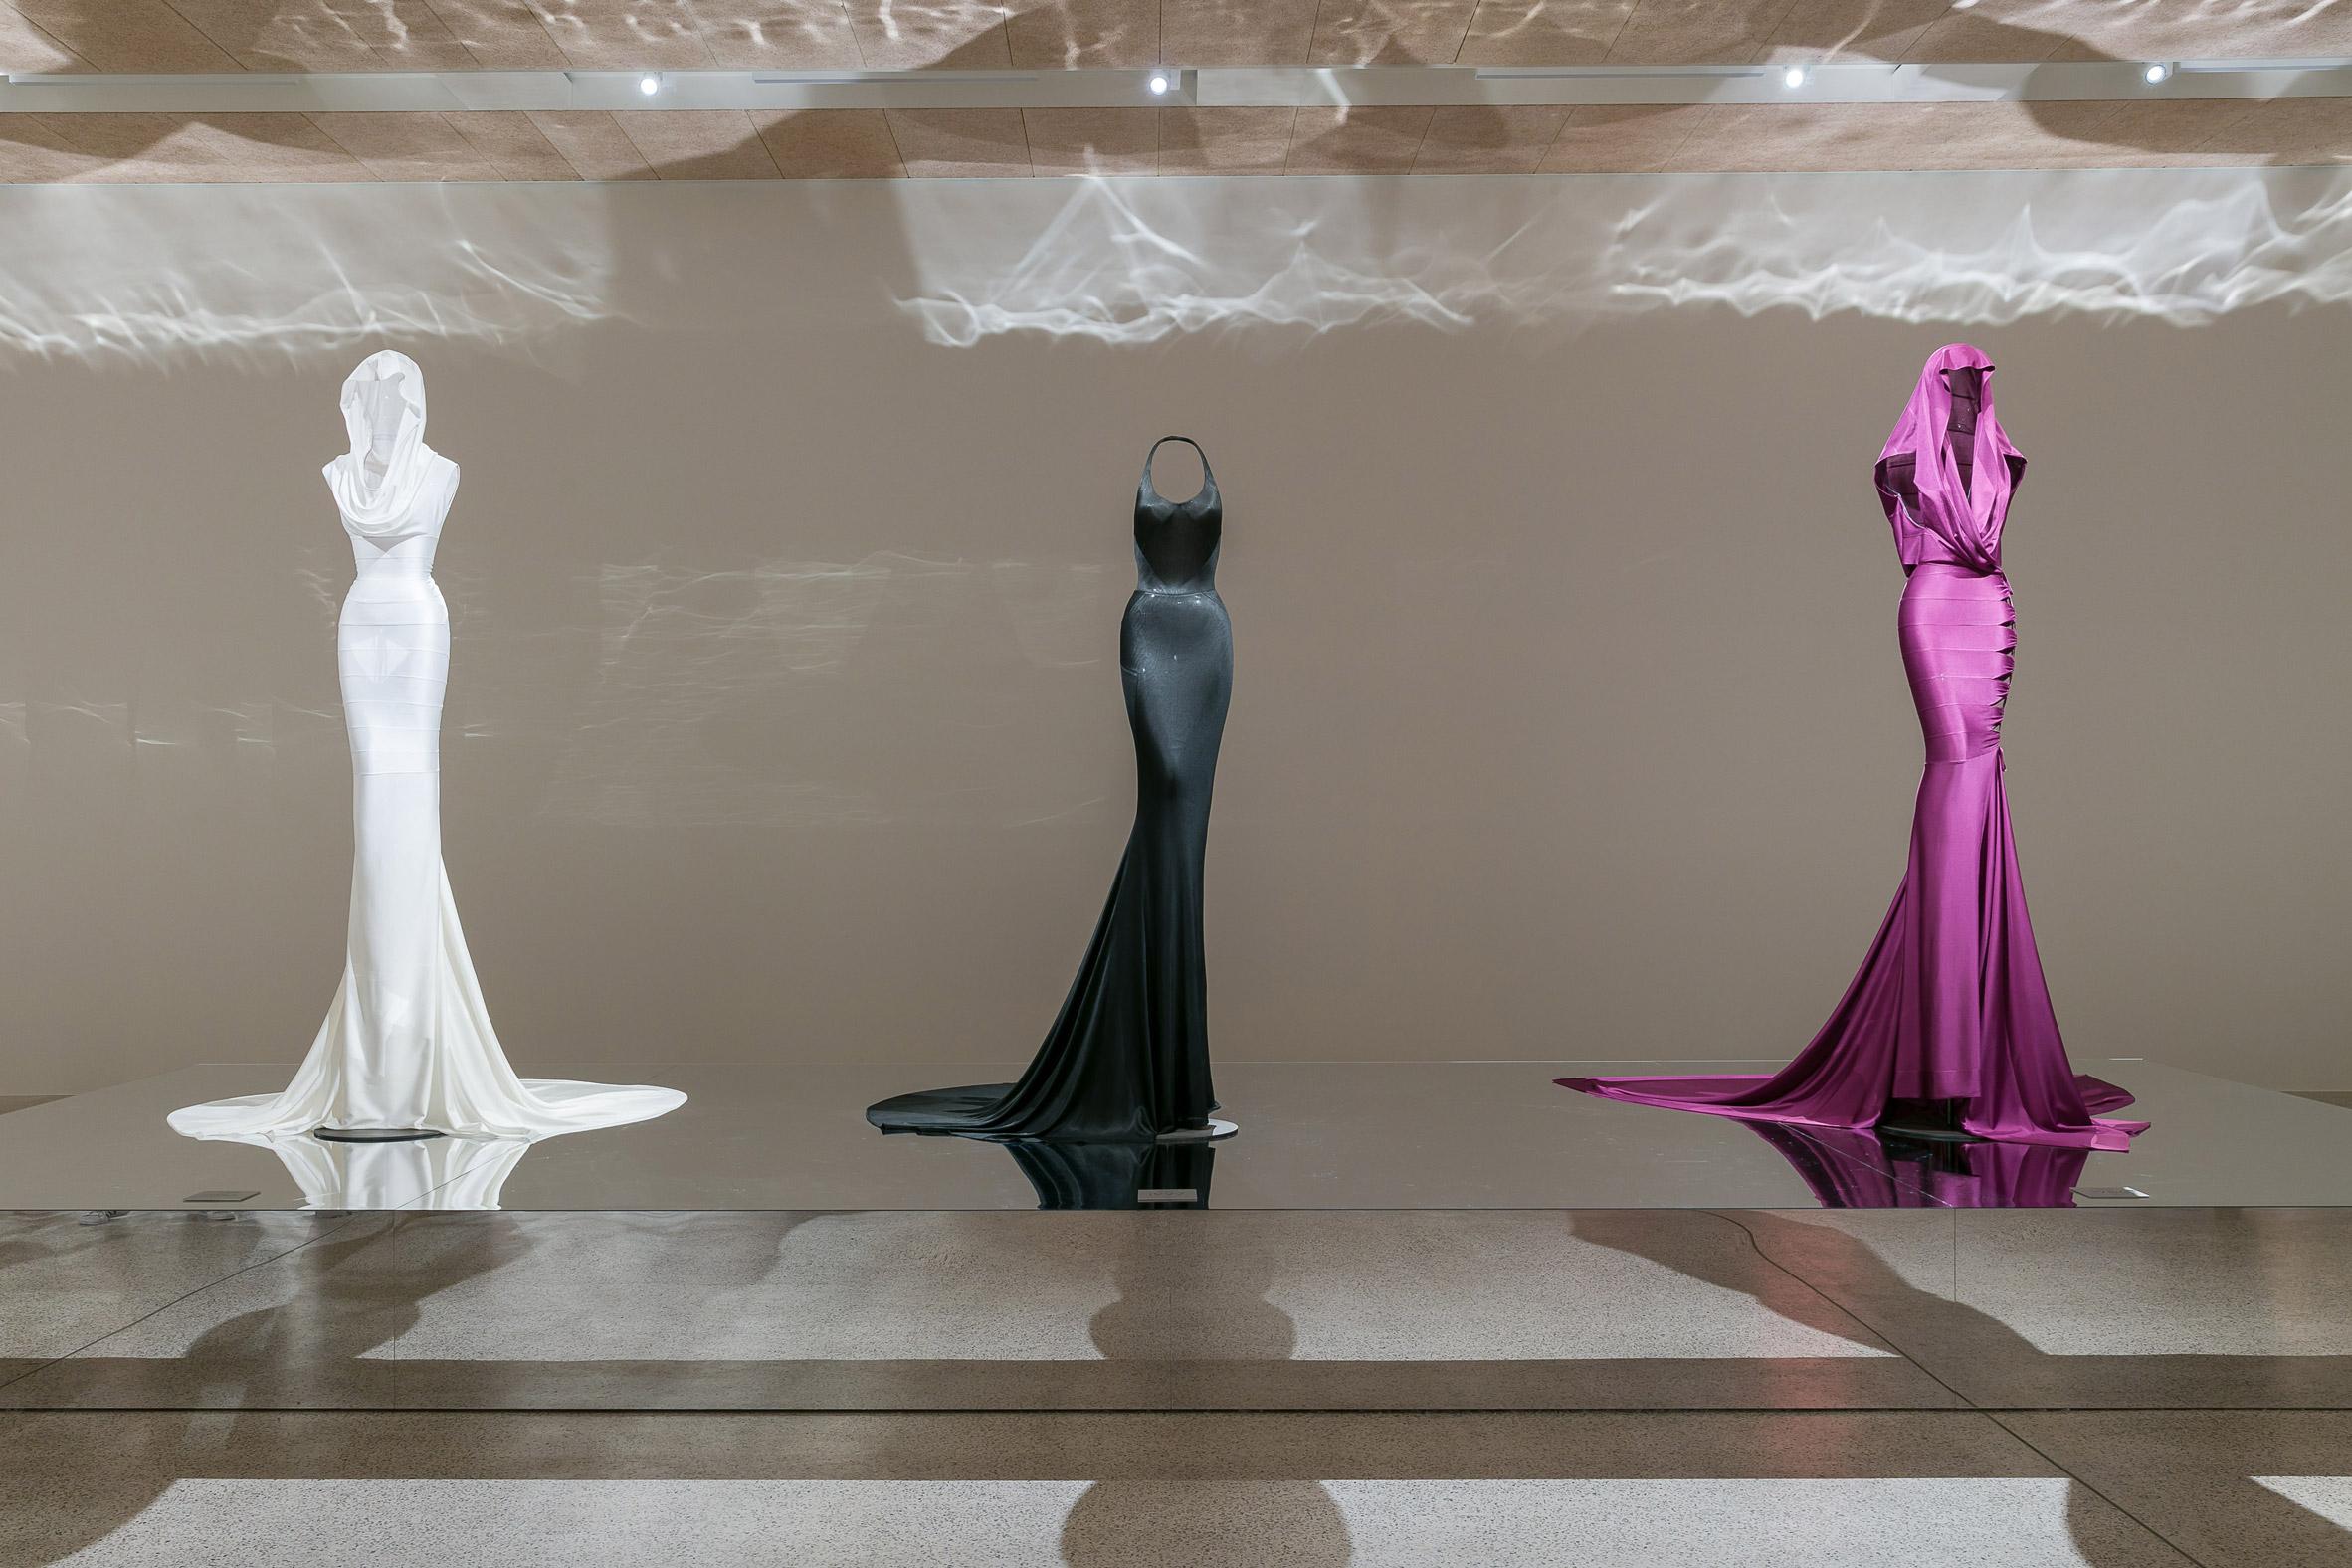 azzedine-alaia-fashion-exhibition-design_dezeen_2364_col_0.jpg